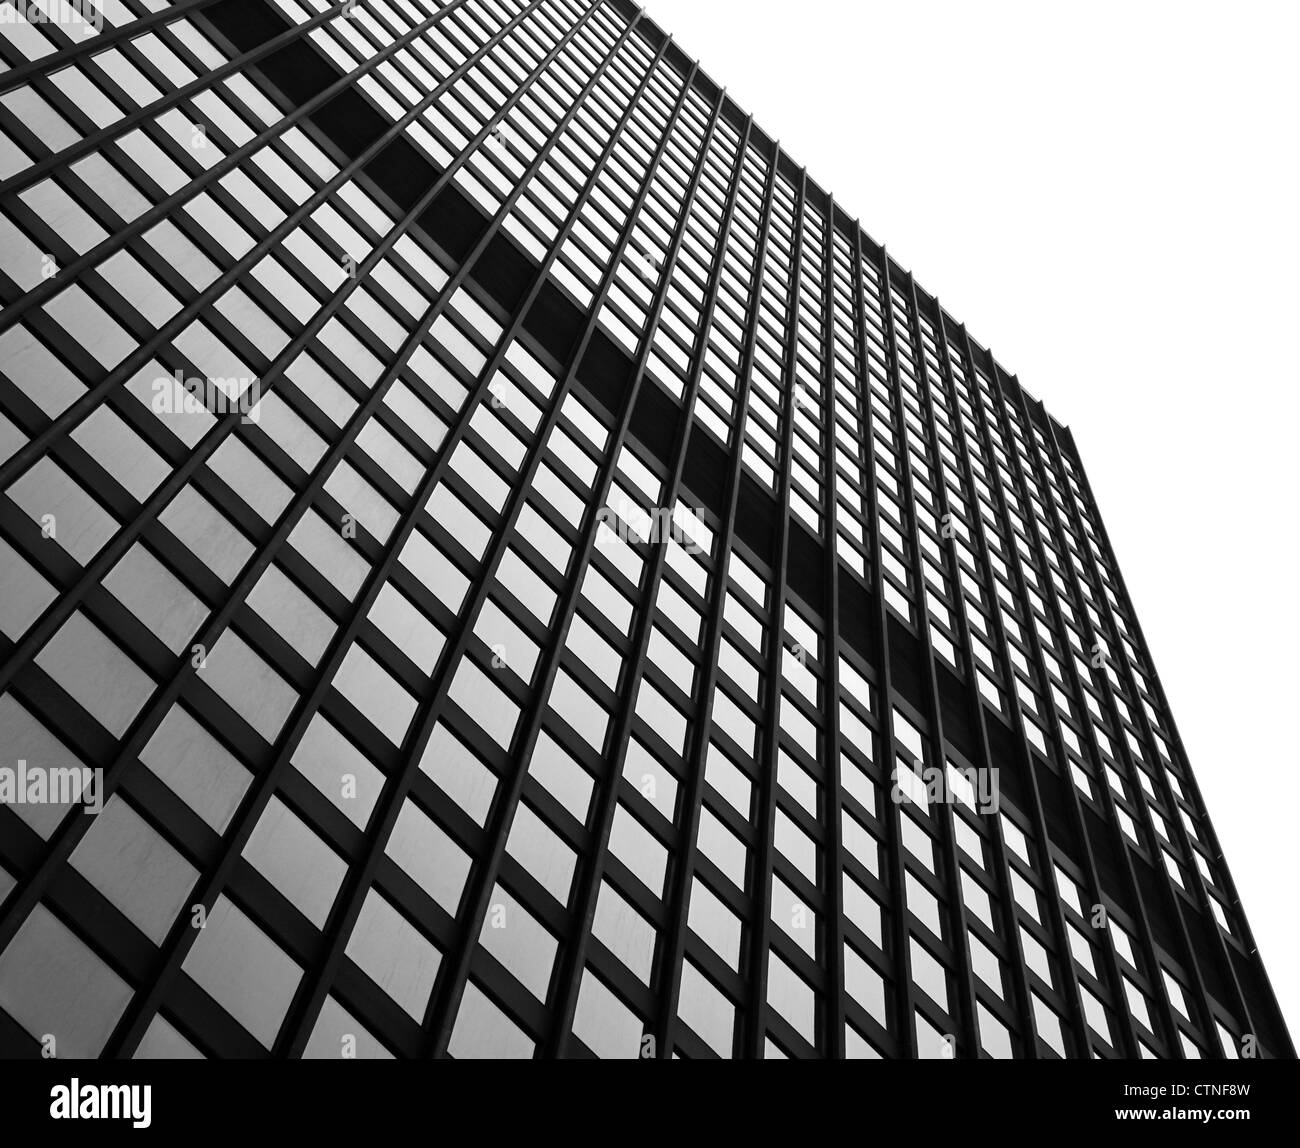 Modern Architecture Toronto modern architecture toronto stock photo, royalty free image